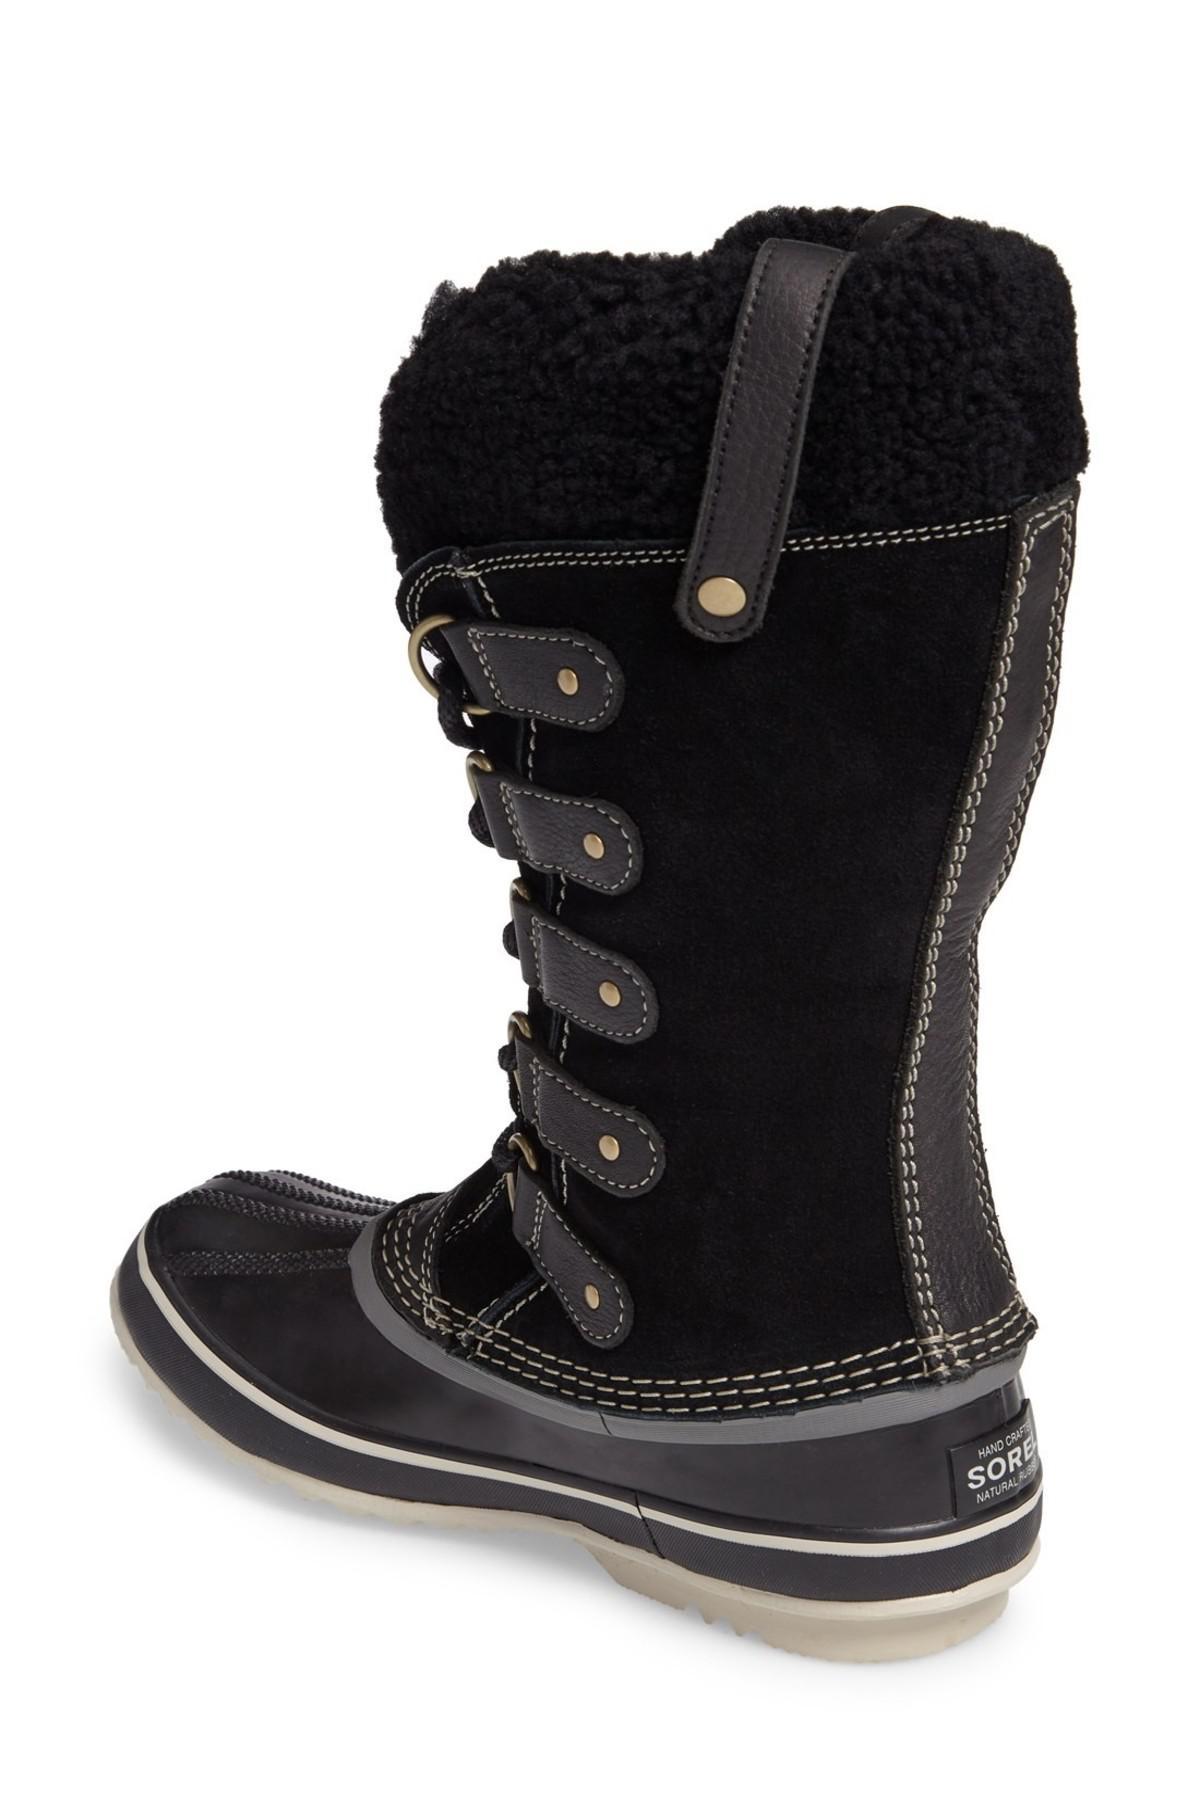 6ac5645e2ab Lyst - Sorel Joan Of Arctic Genuine Shearling Waterproof Boot (women ...